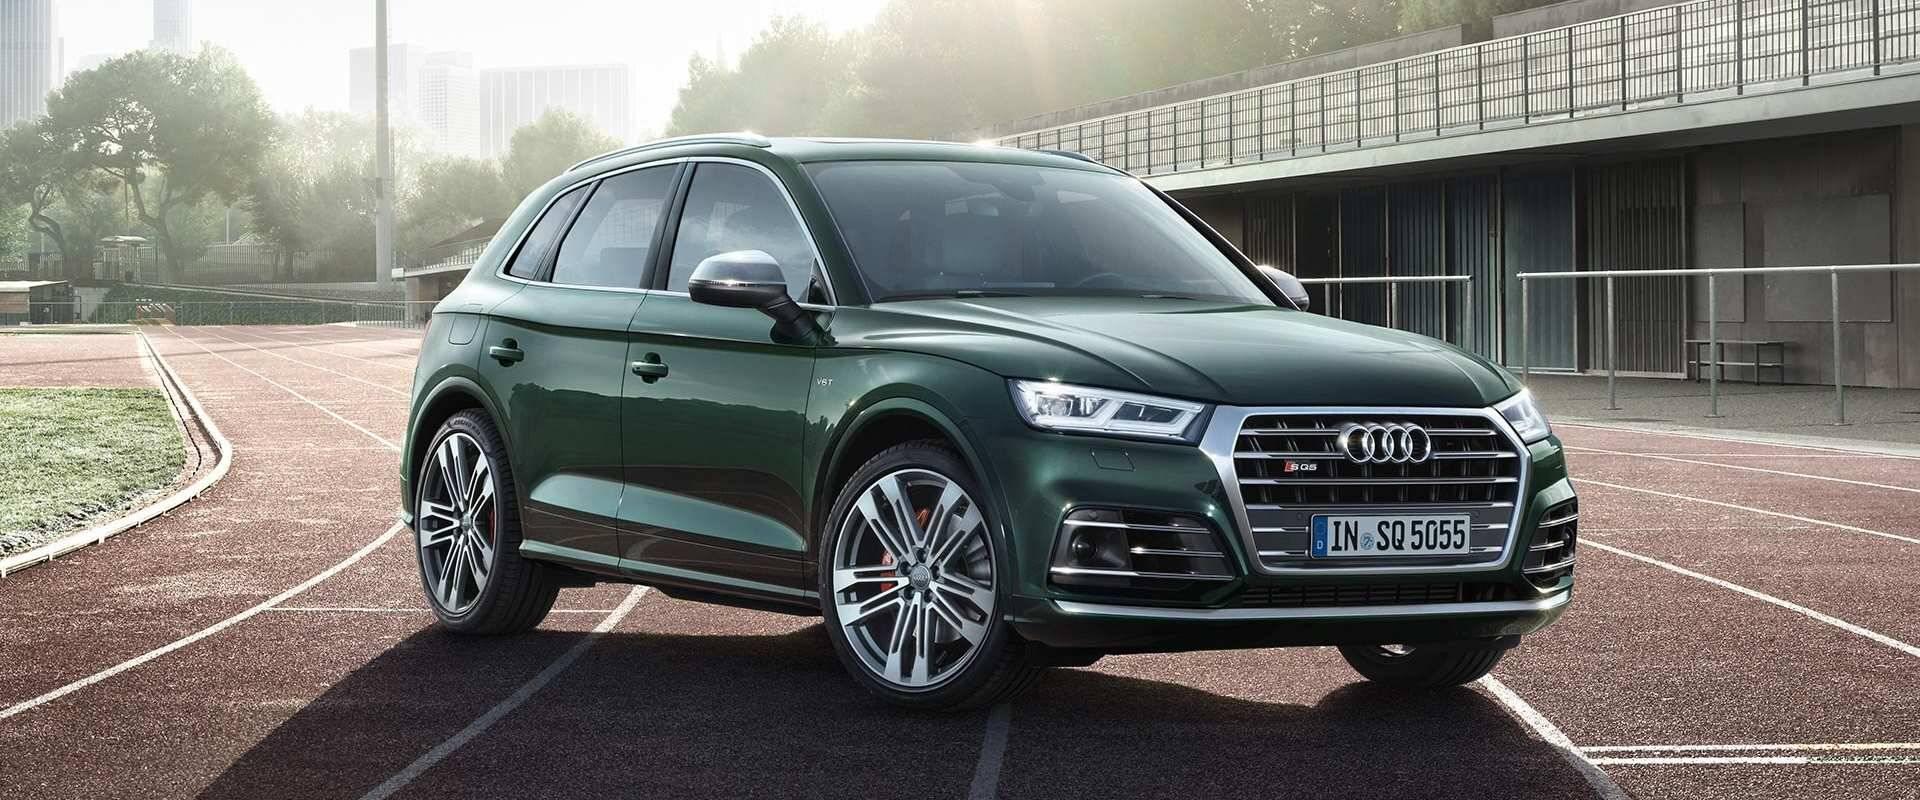 Nouvelle Audi SQ5 TDI 2019 profil